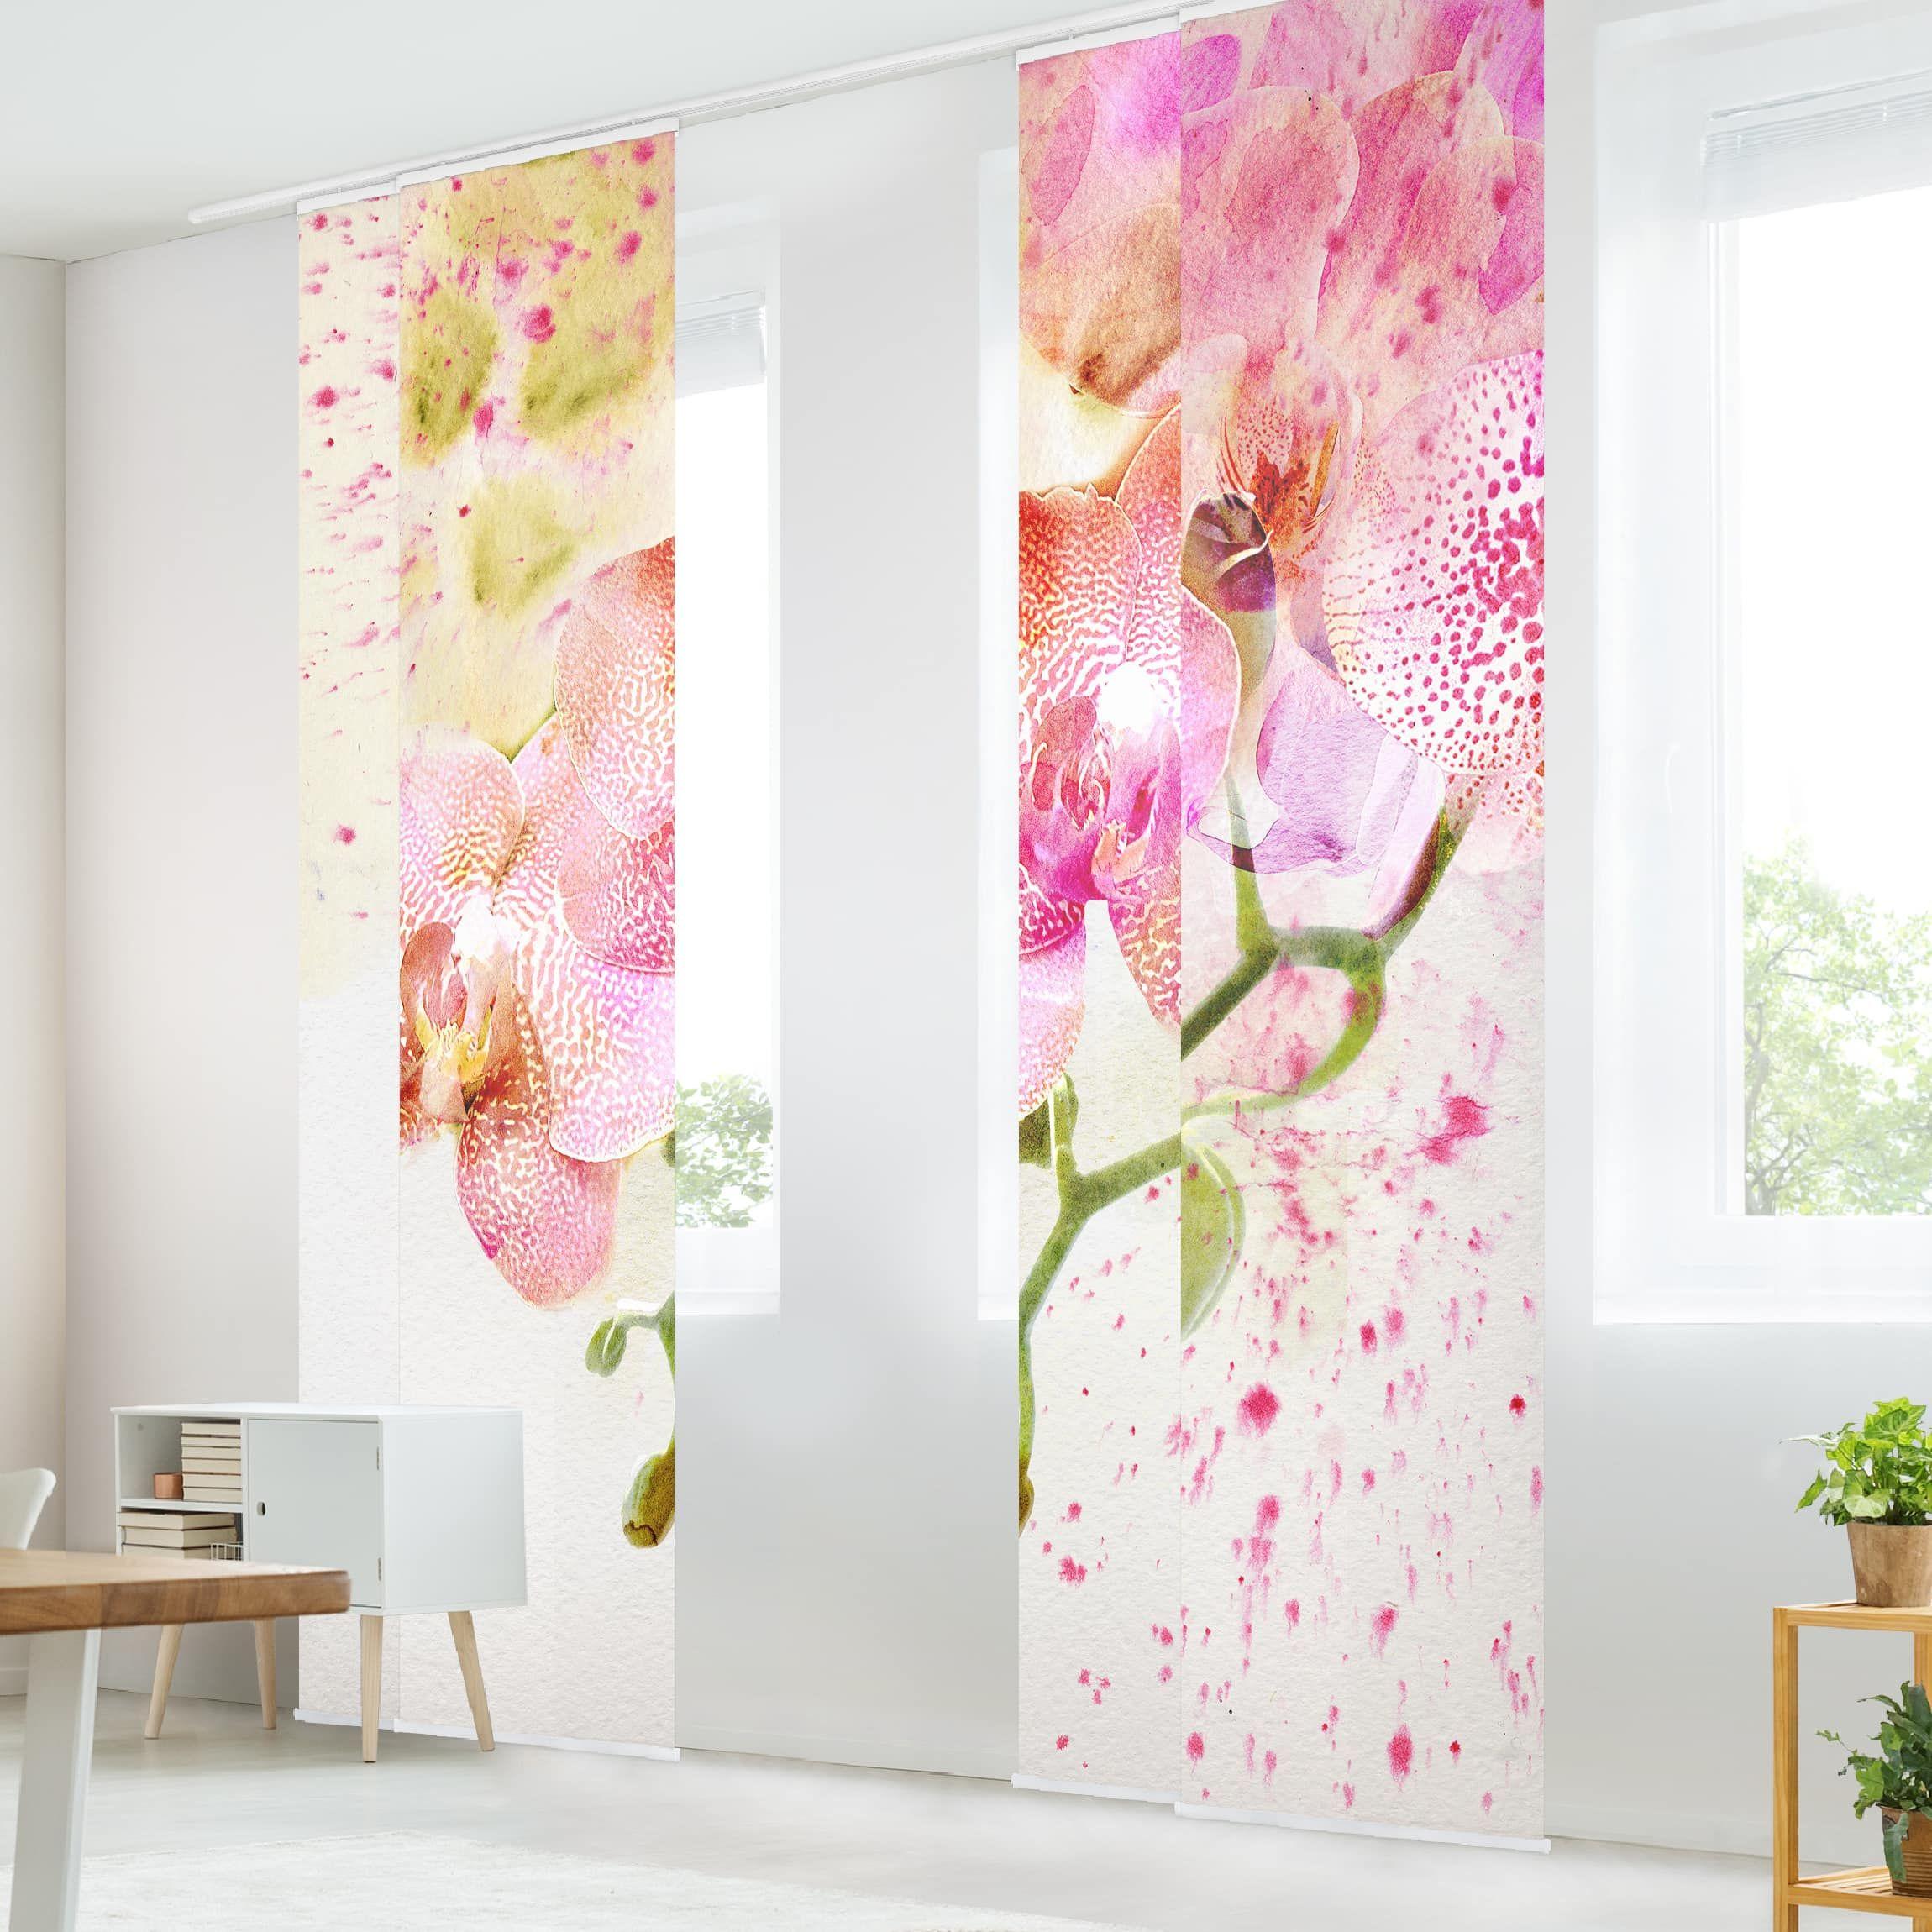 Schiebegardinen Set – Aquarell Blumen Orchideen – 4 Flächenvorhänge